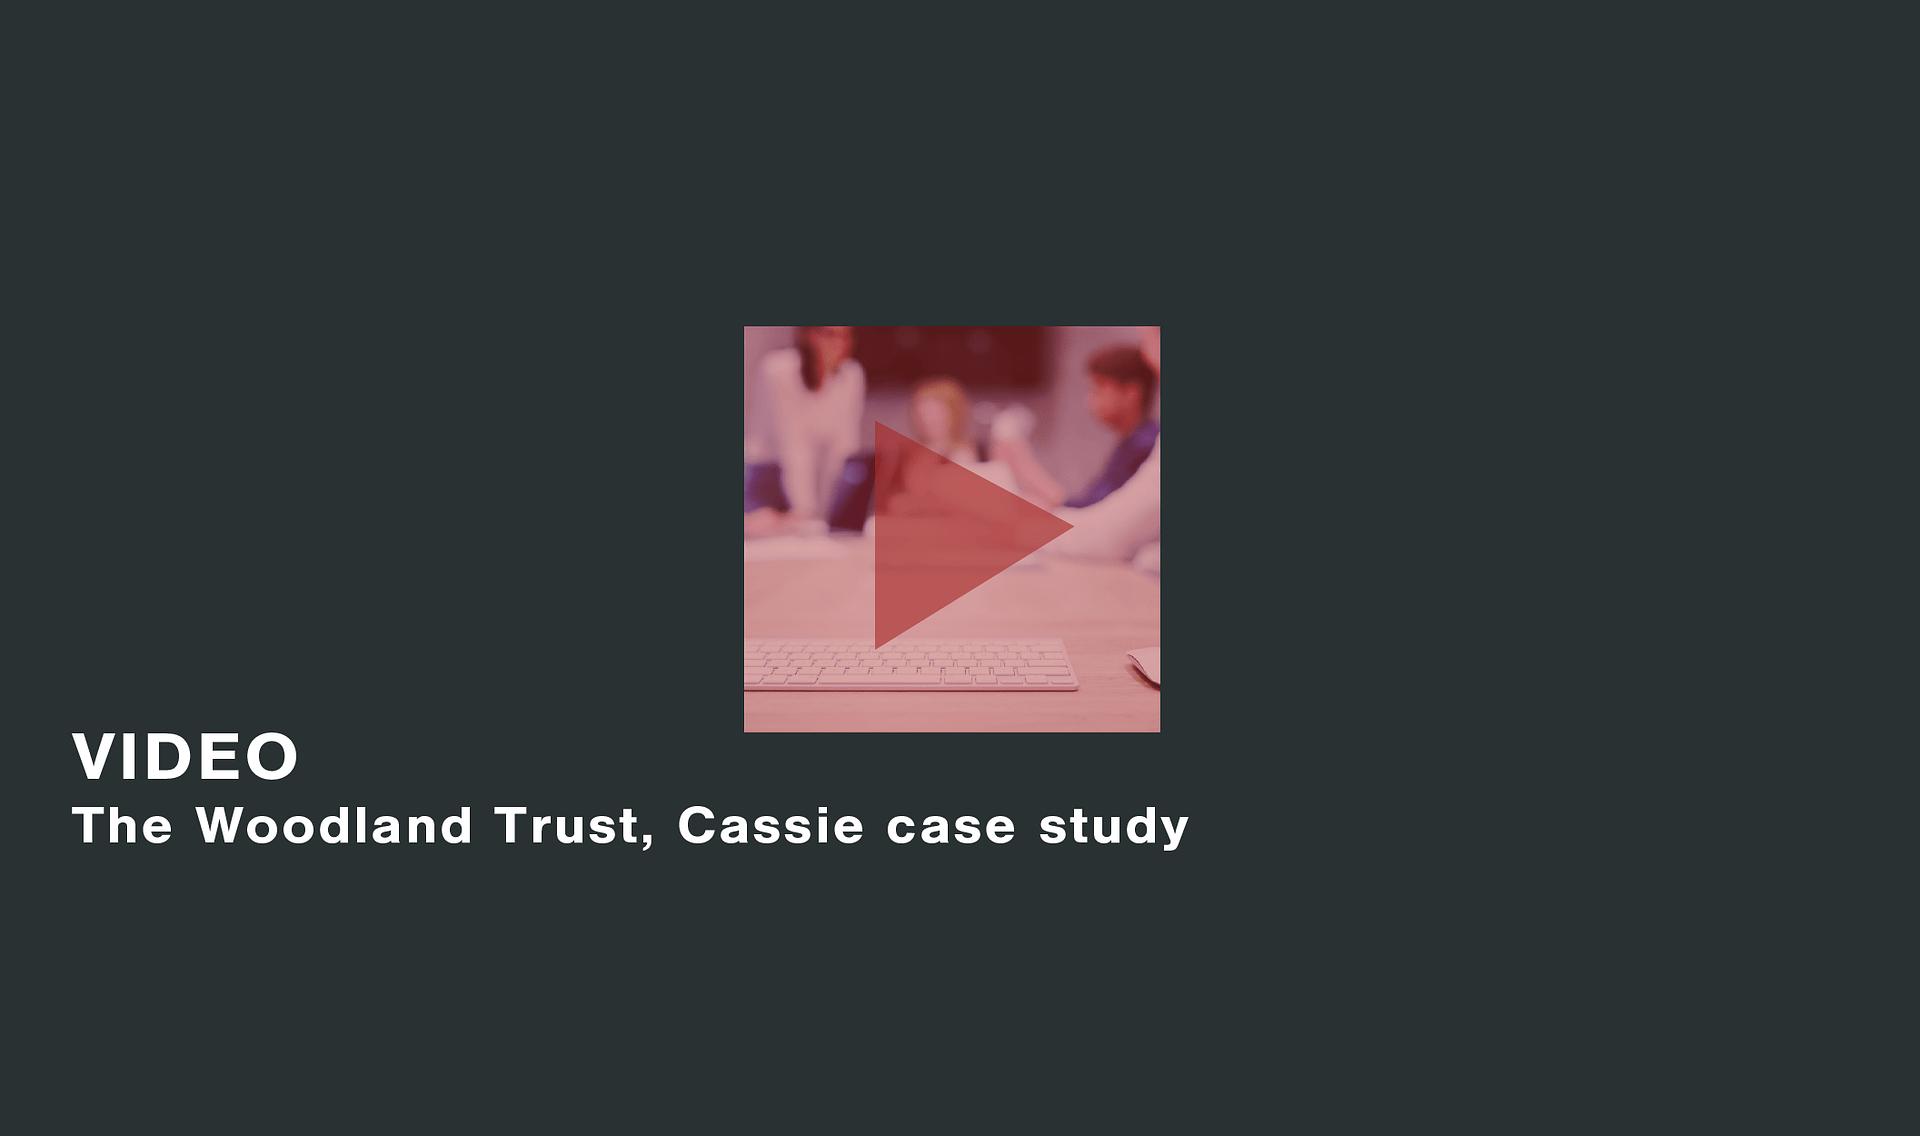 The-Woodland-Trust-Cassie-case-study